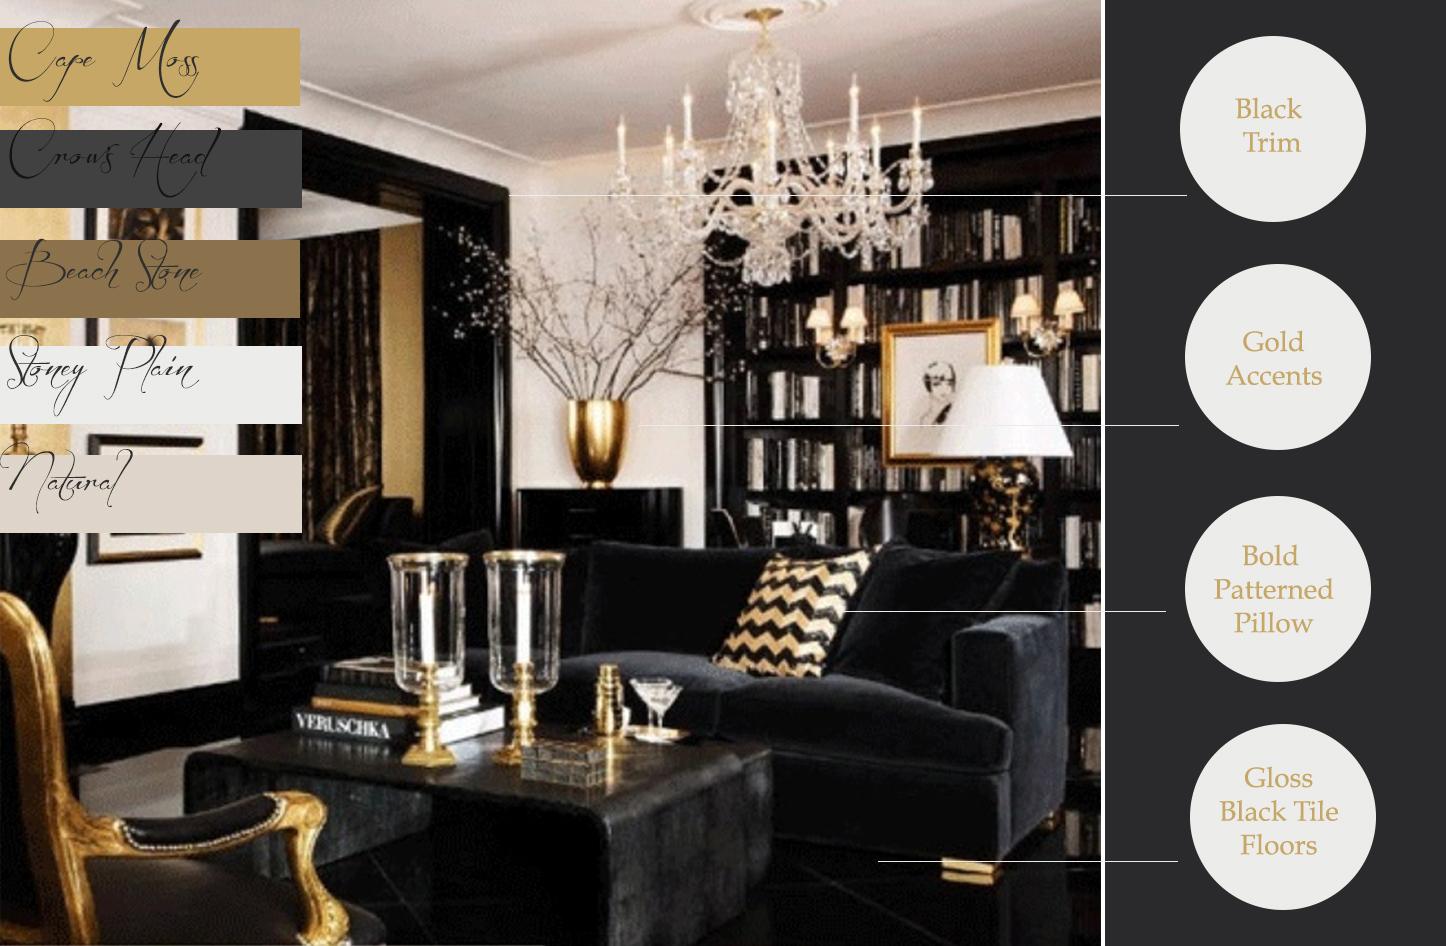 awl in good taste.: Future rooms.